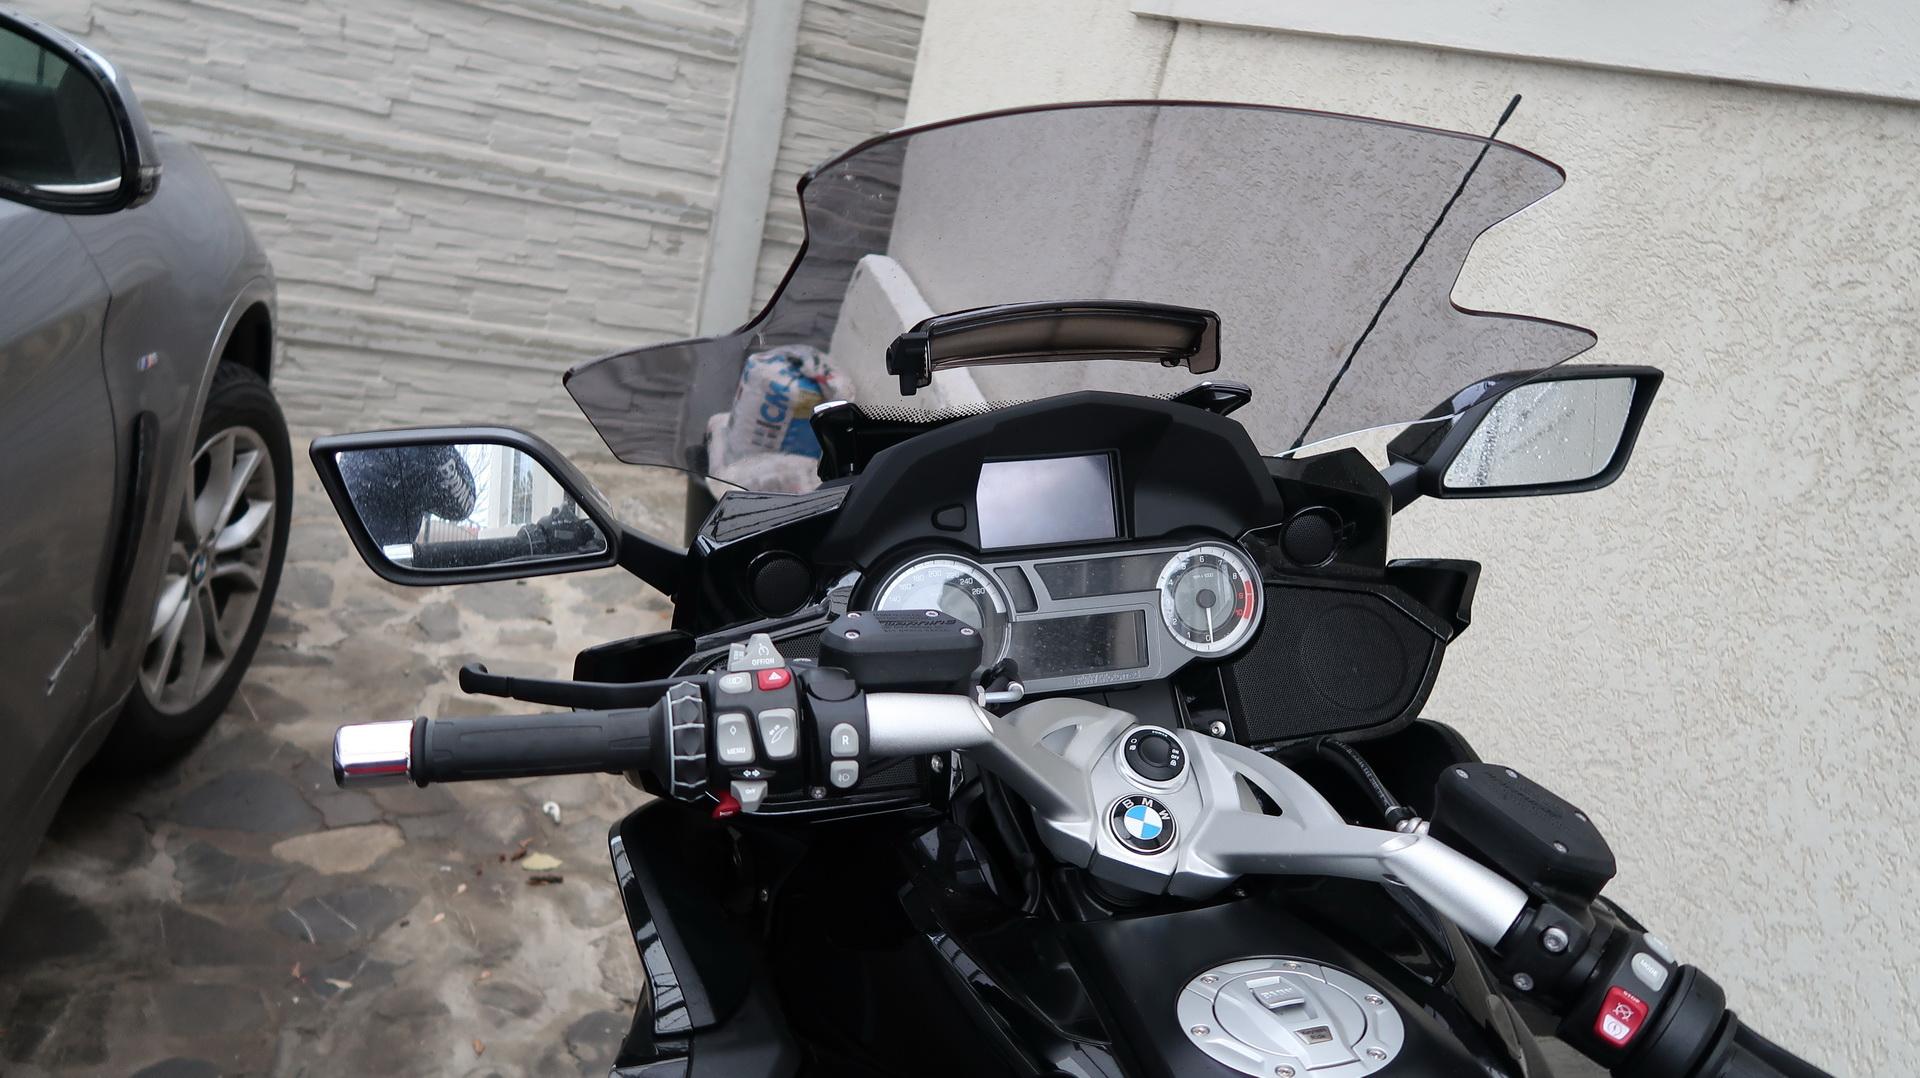 BMW Of Newport >> Wunderlich screen on K1600B - PICS - BMW K1600 Forum : BMW ...